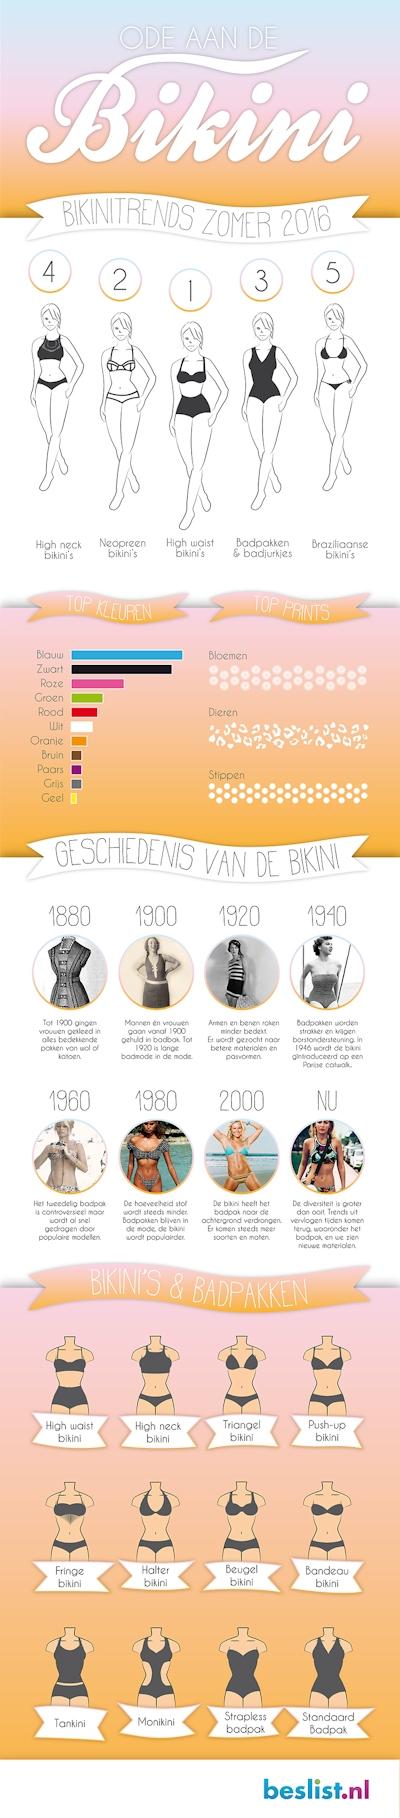 bikini-infographic-760grand